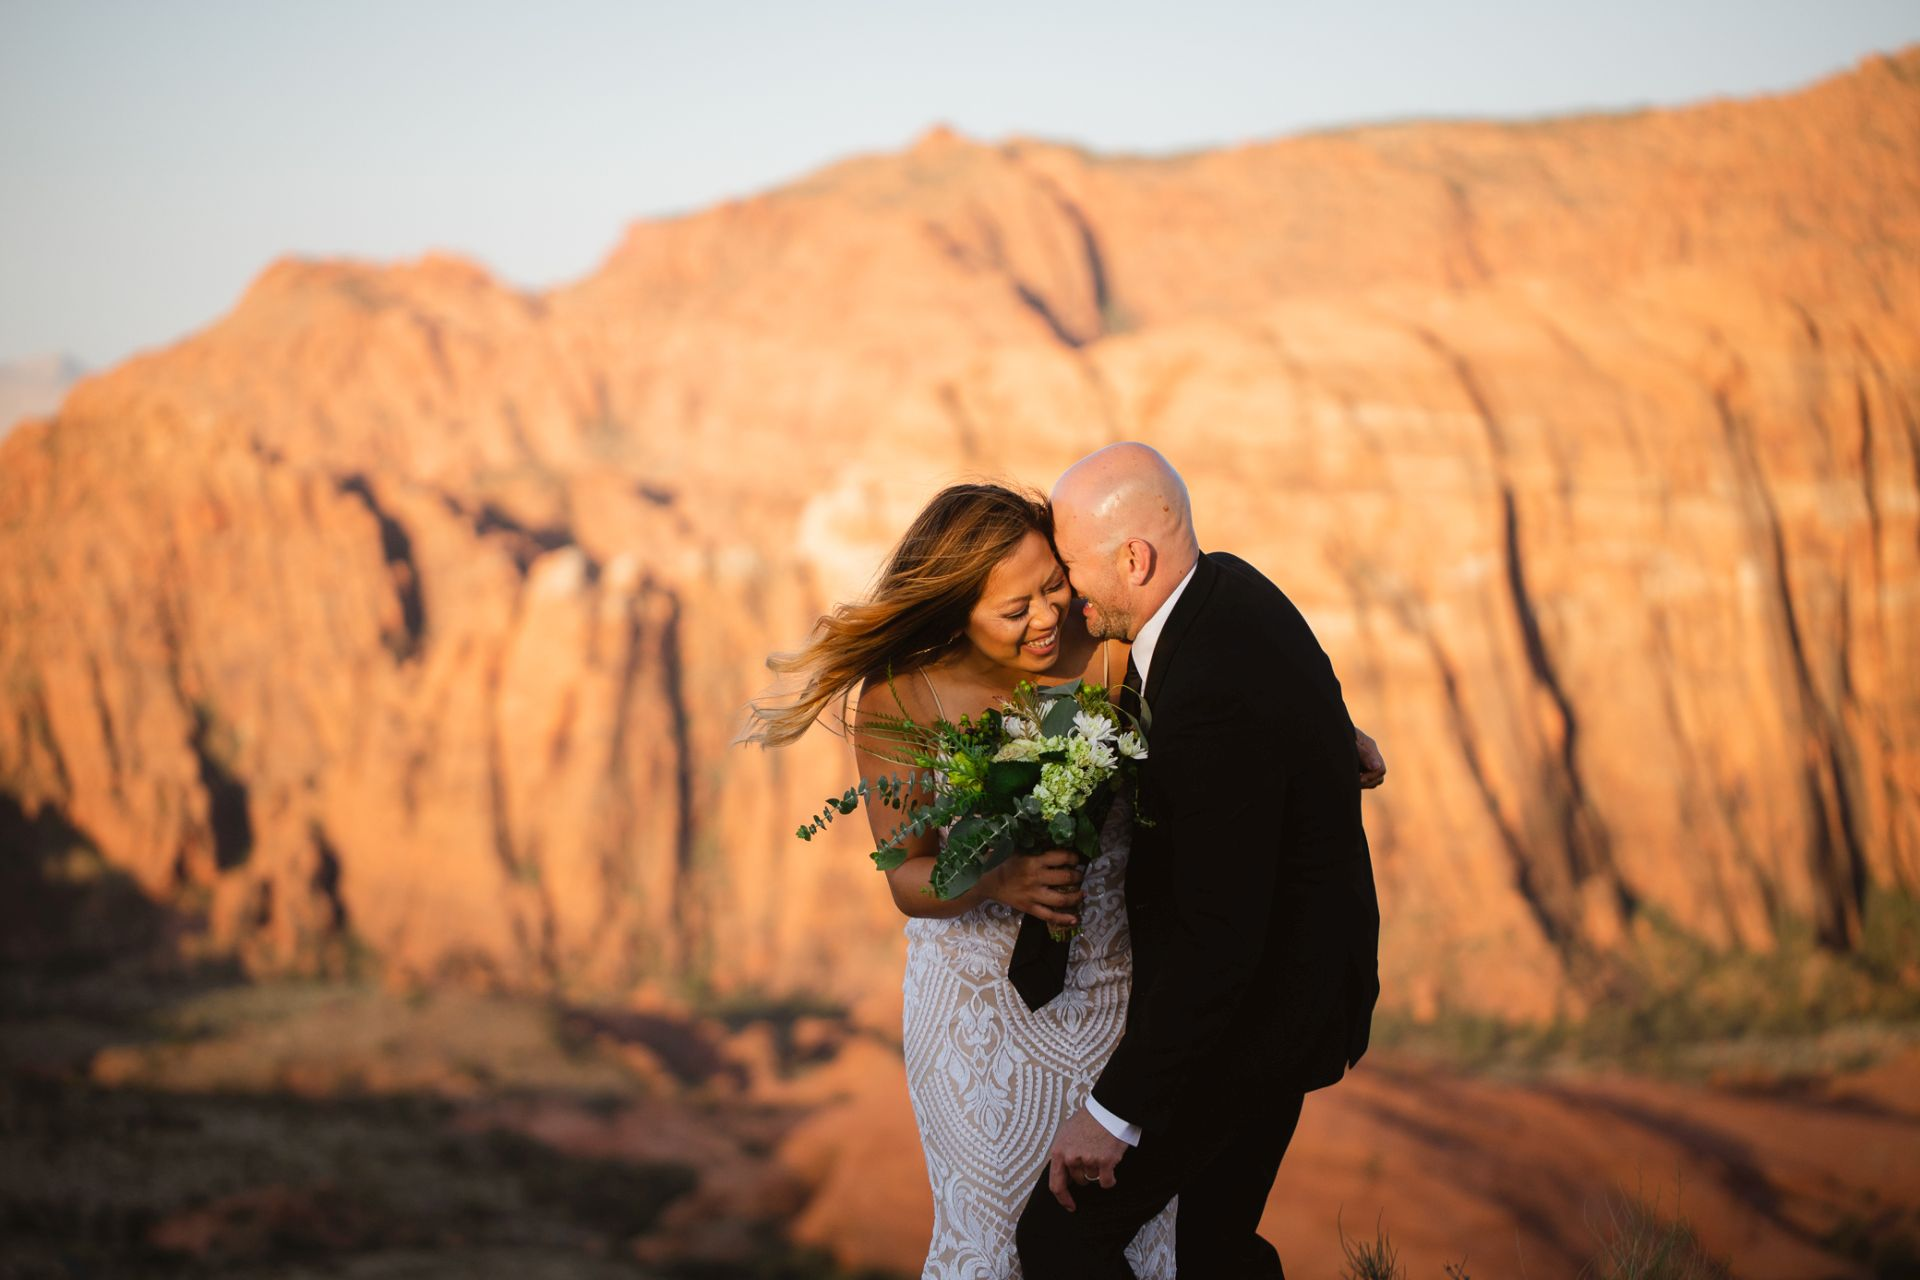 adventure wedding utah desert - photographer captures couple deeply in love before glowing mountain range